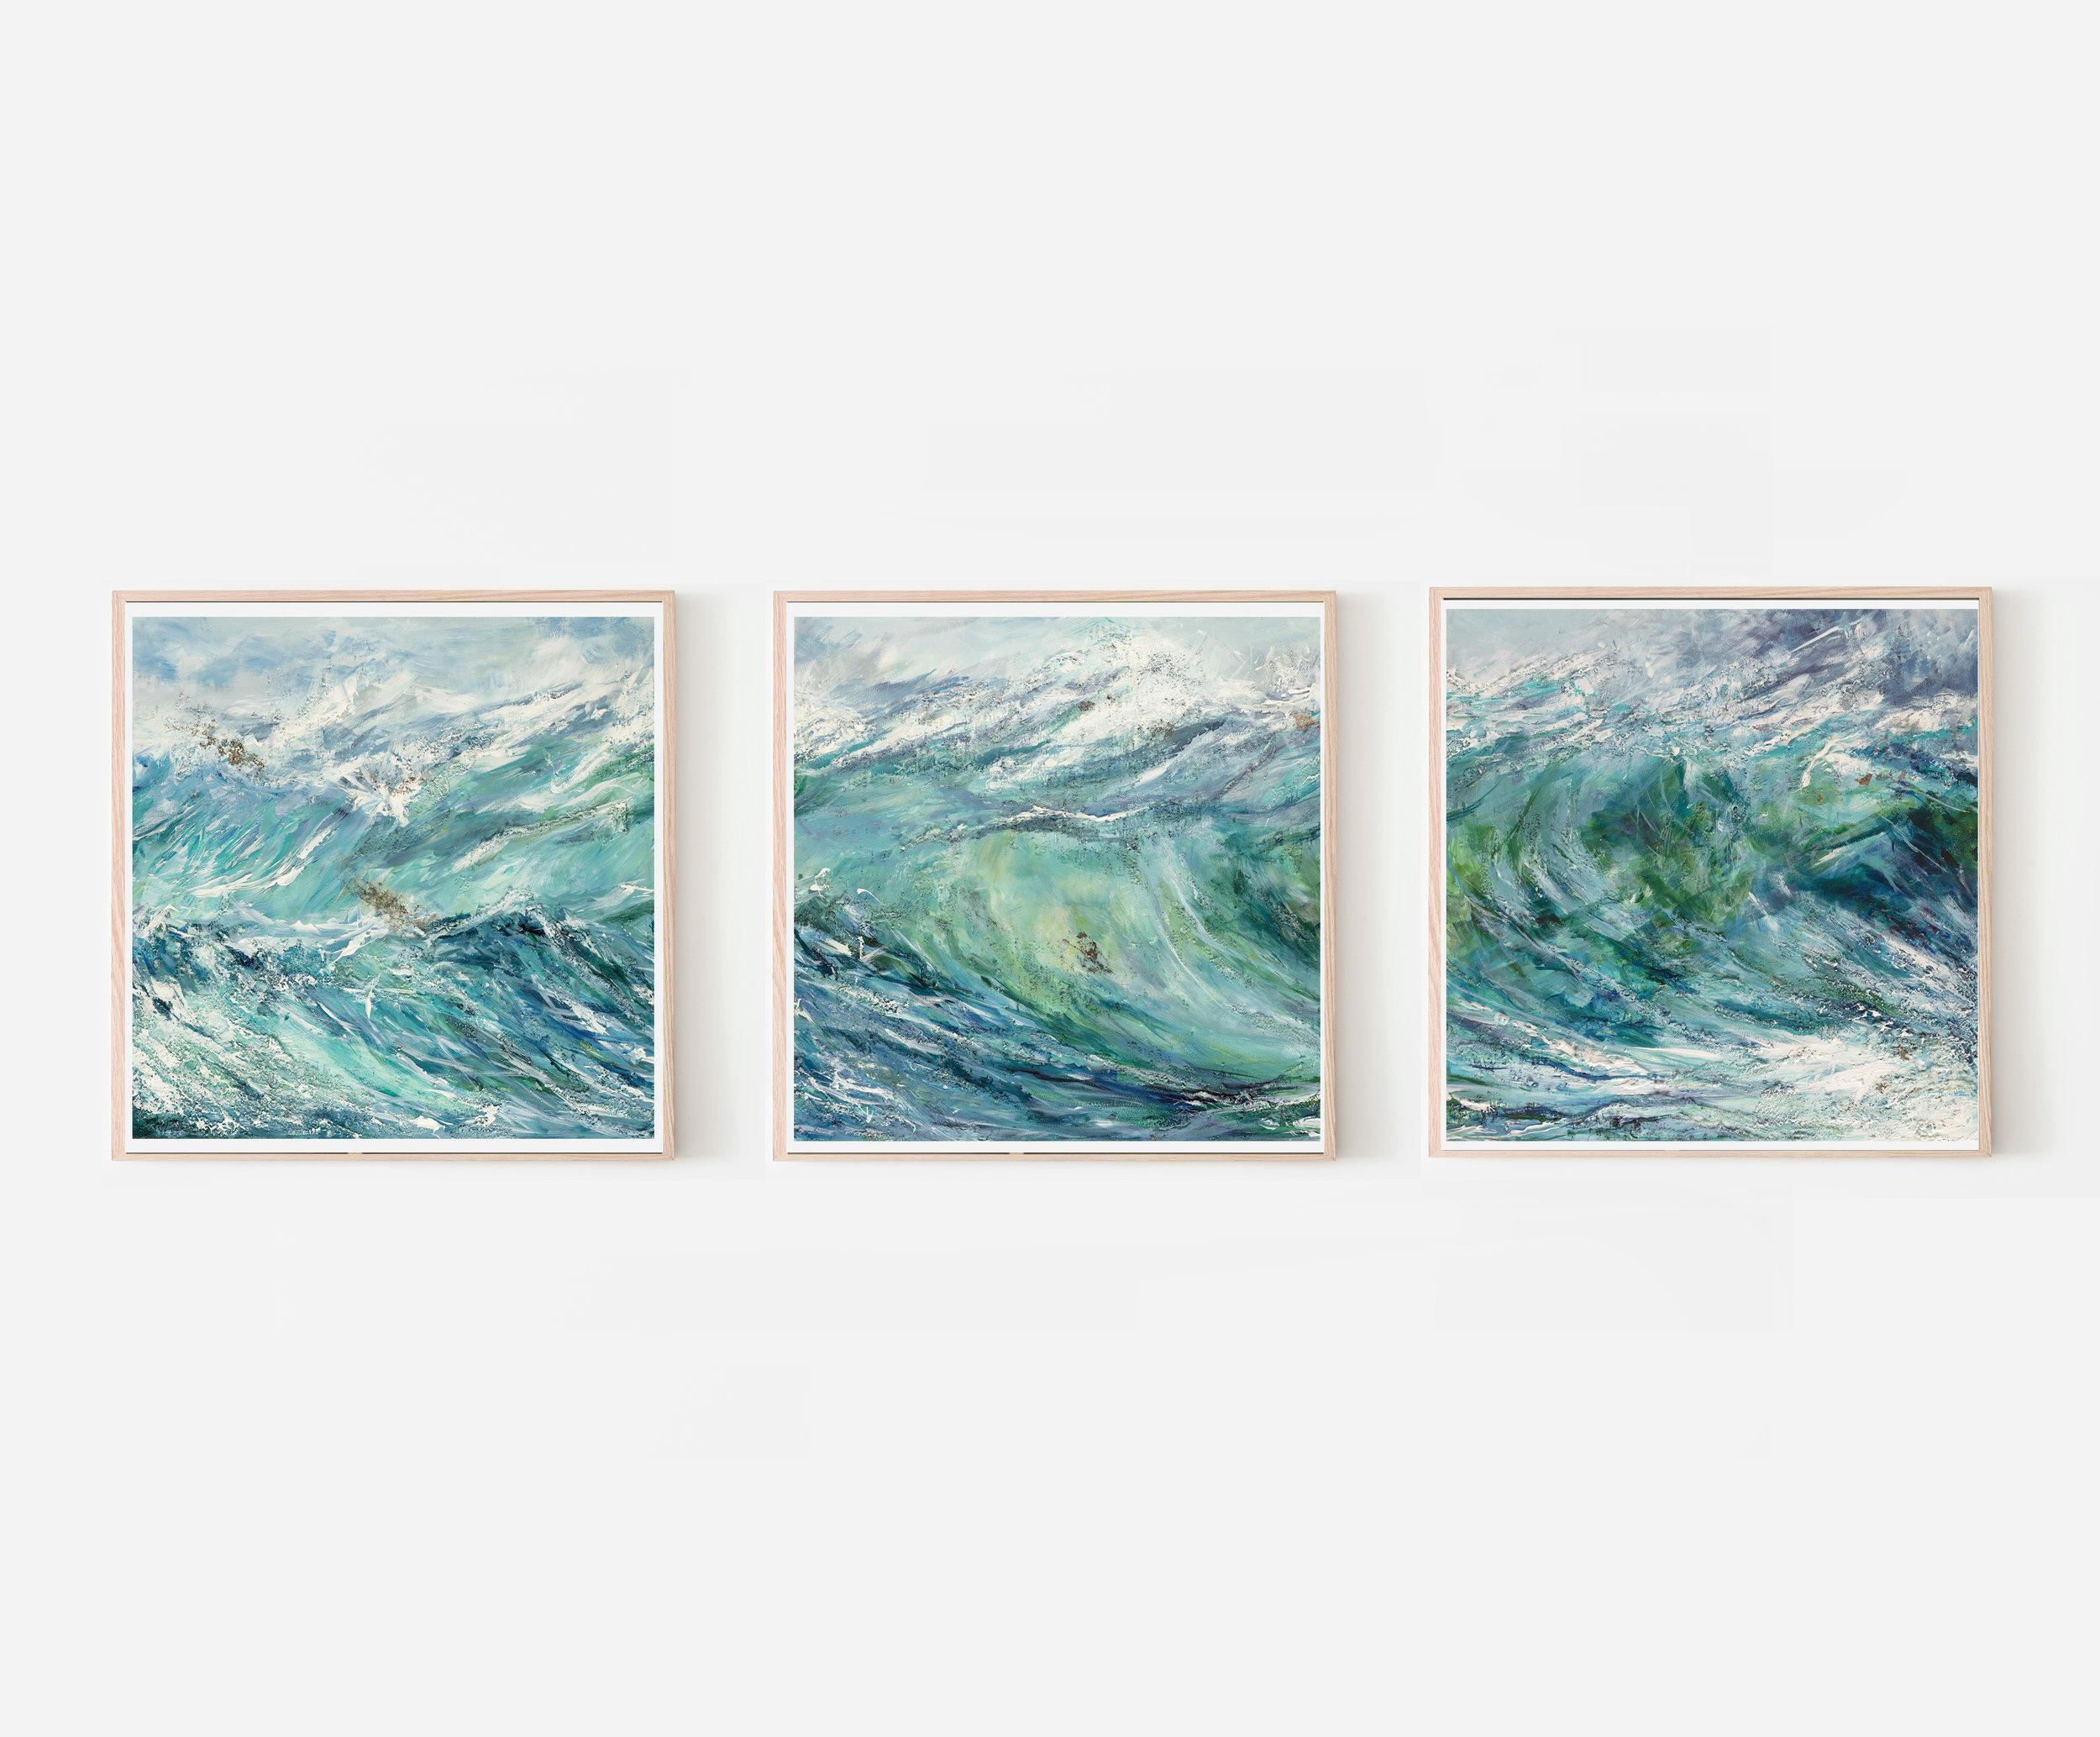 Set of 3 'Breaking Wave' Giclée Prints by Charlotte Farrow